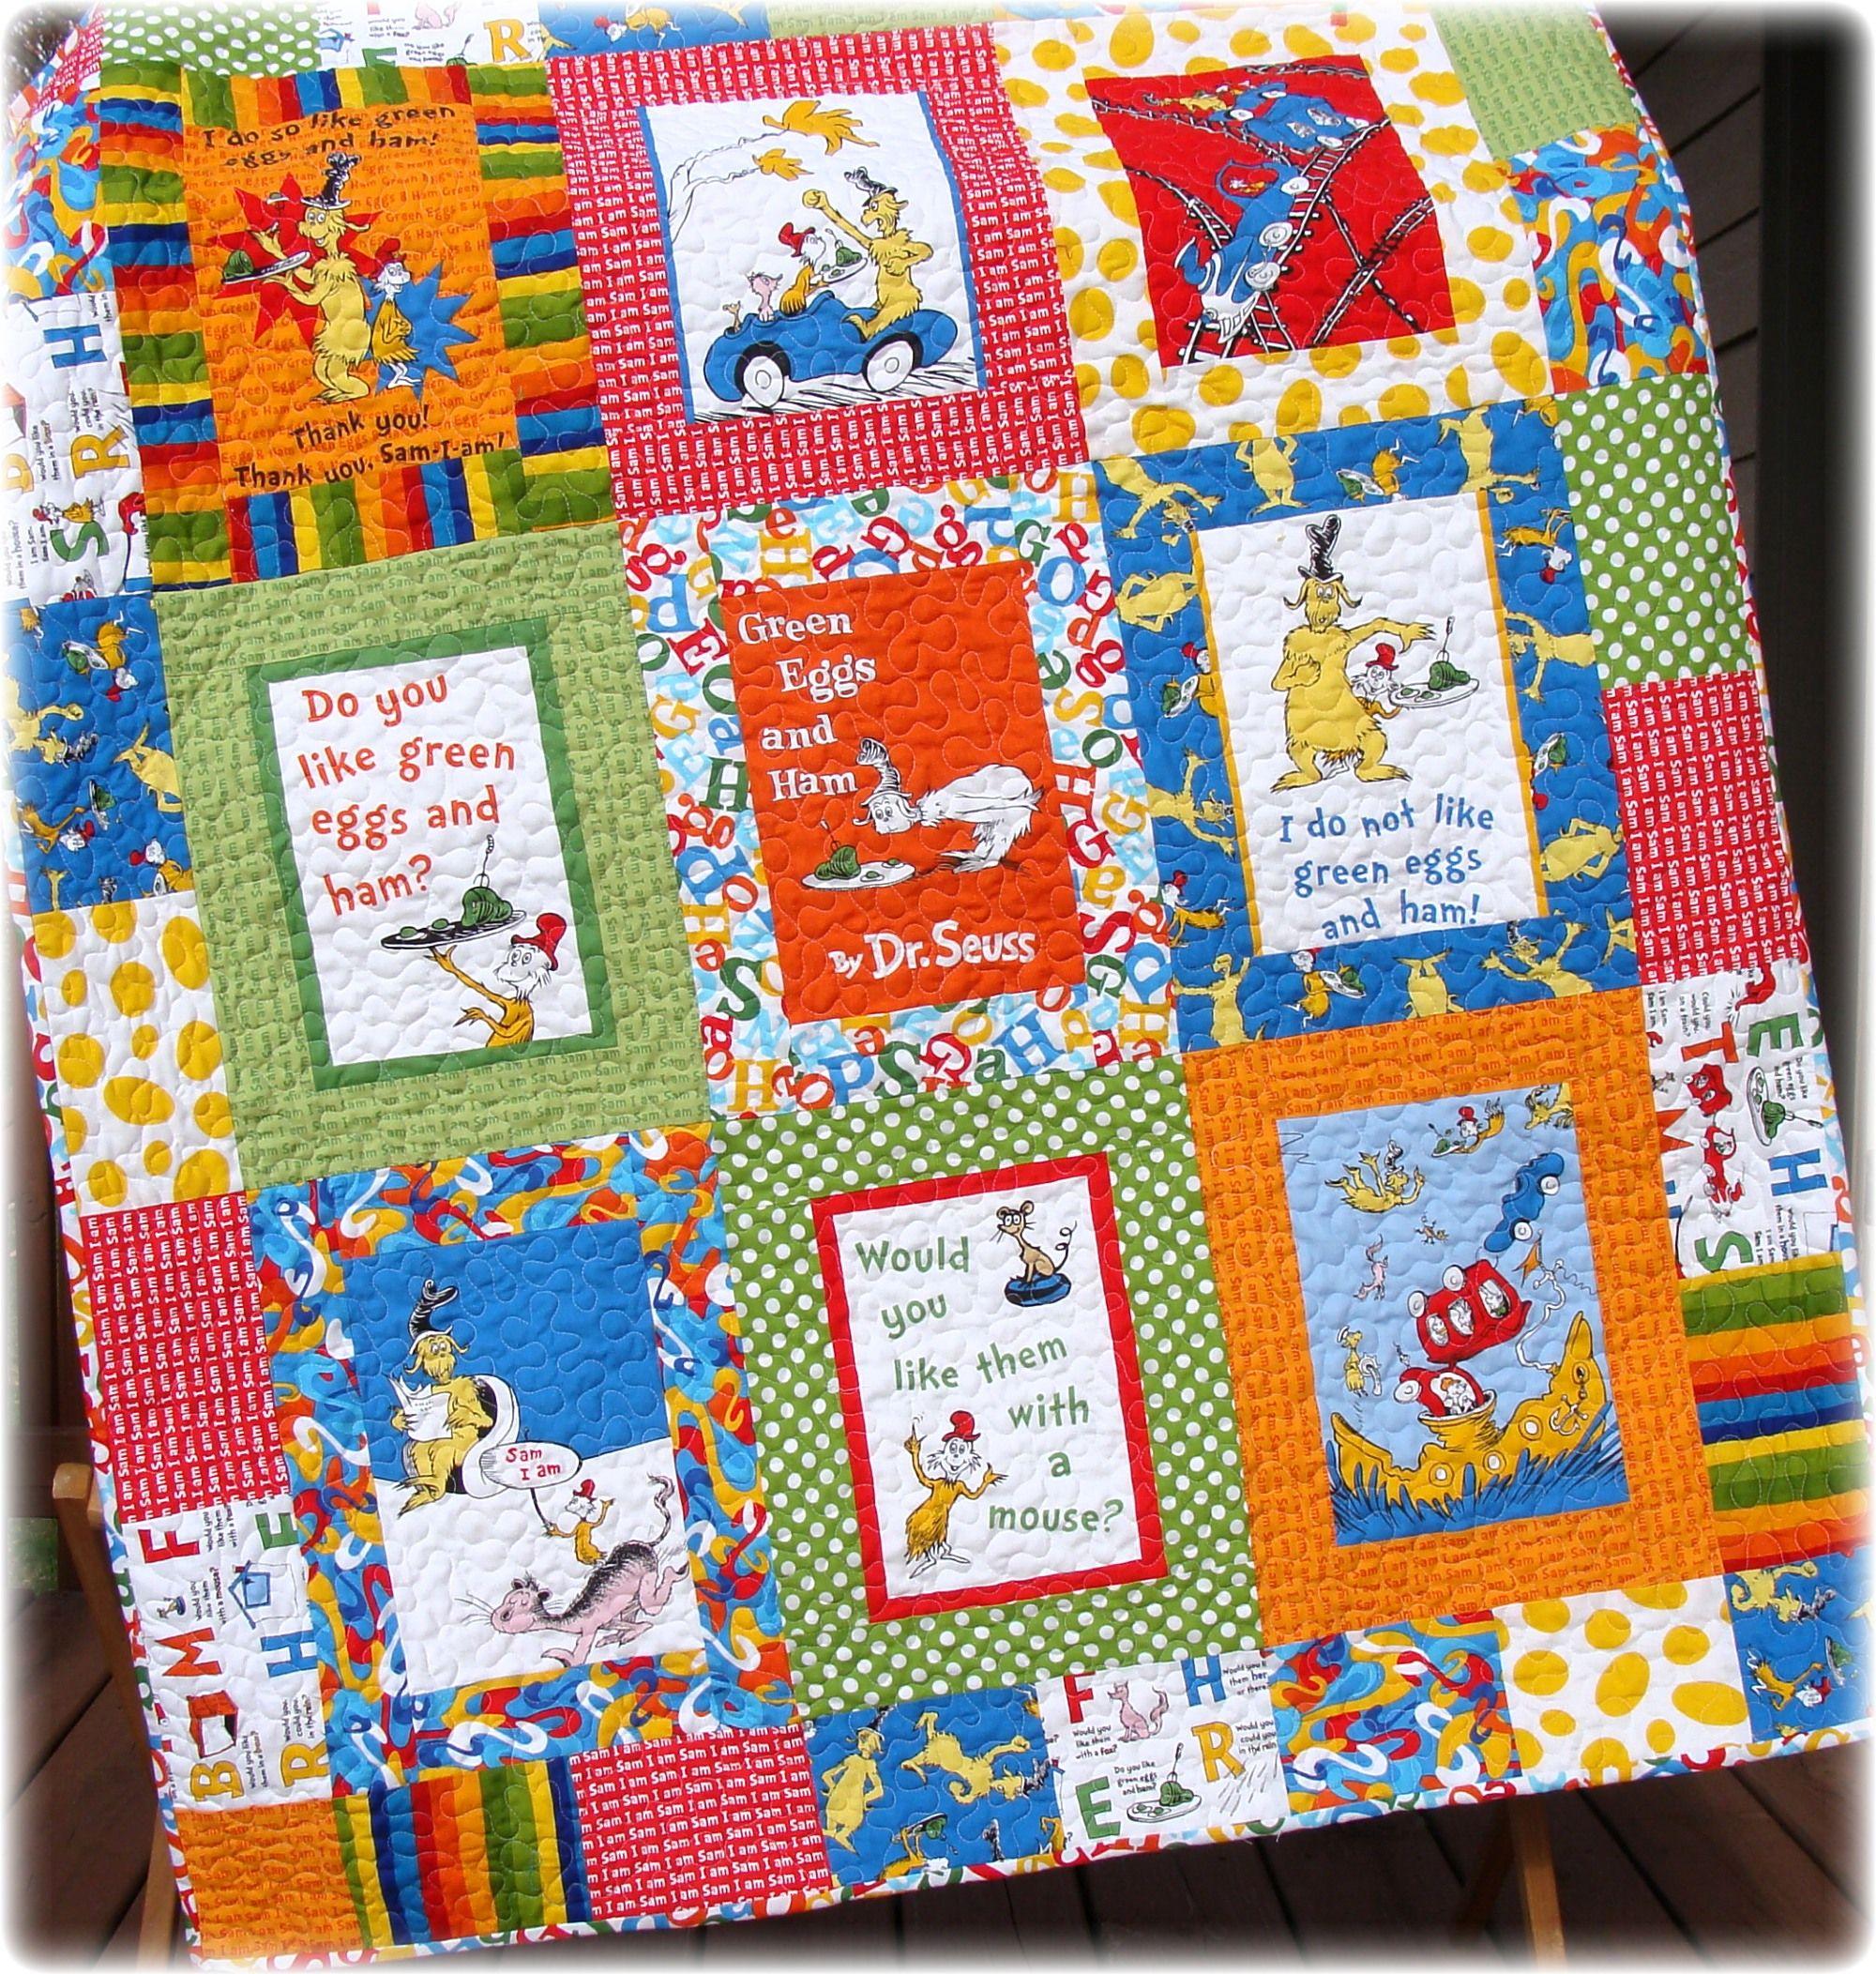 Green Eggs and Ham Baby Quilt   Baby Wilken #2!   Pinterest ... : dr suess quilt - Adamdwight.com